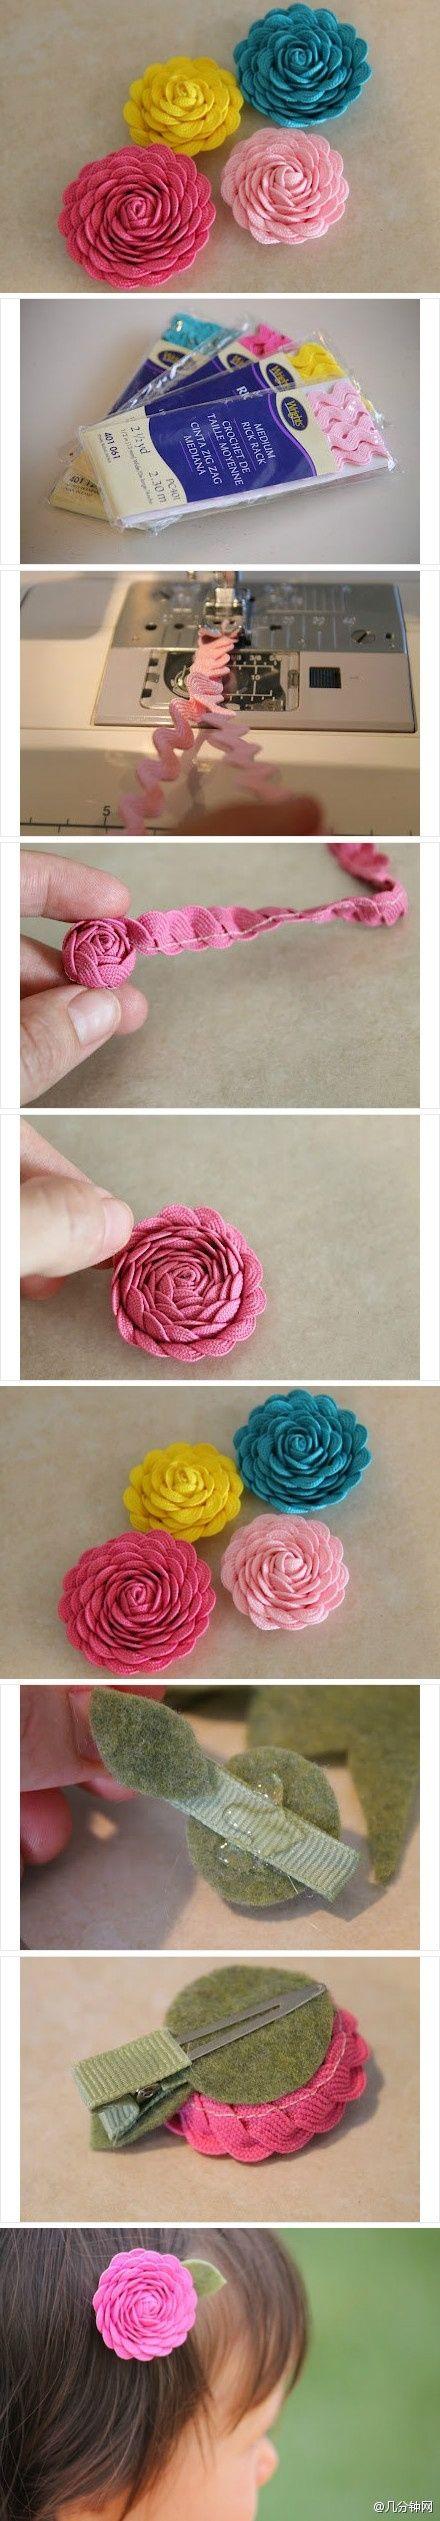 DIY Flower Hair Clip diy craft crafts craft ideas easy crafts diy ideas diy crafts easy diy diy hair diy bow craft bow craft accessories